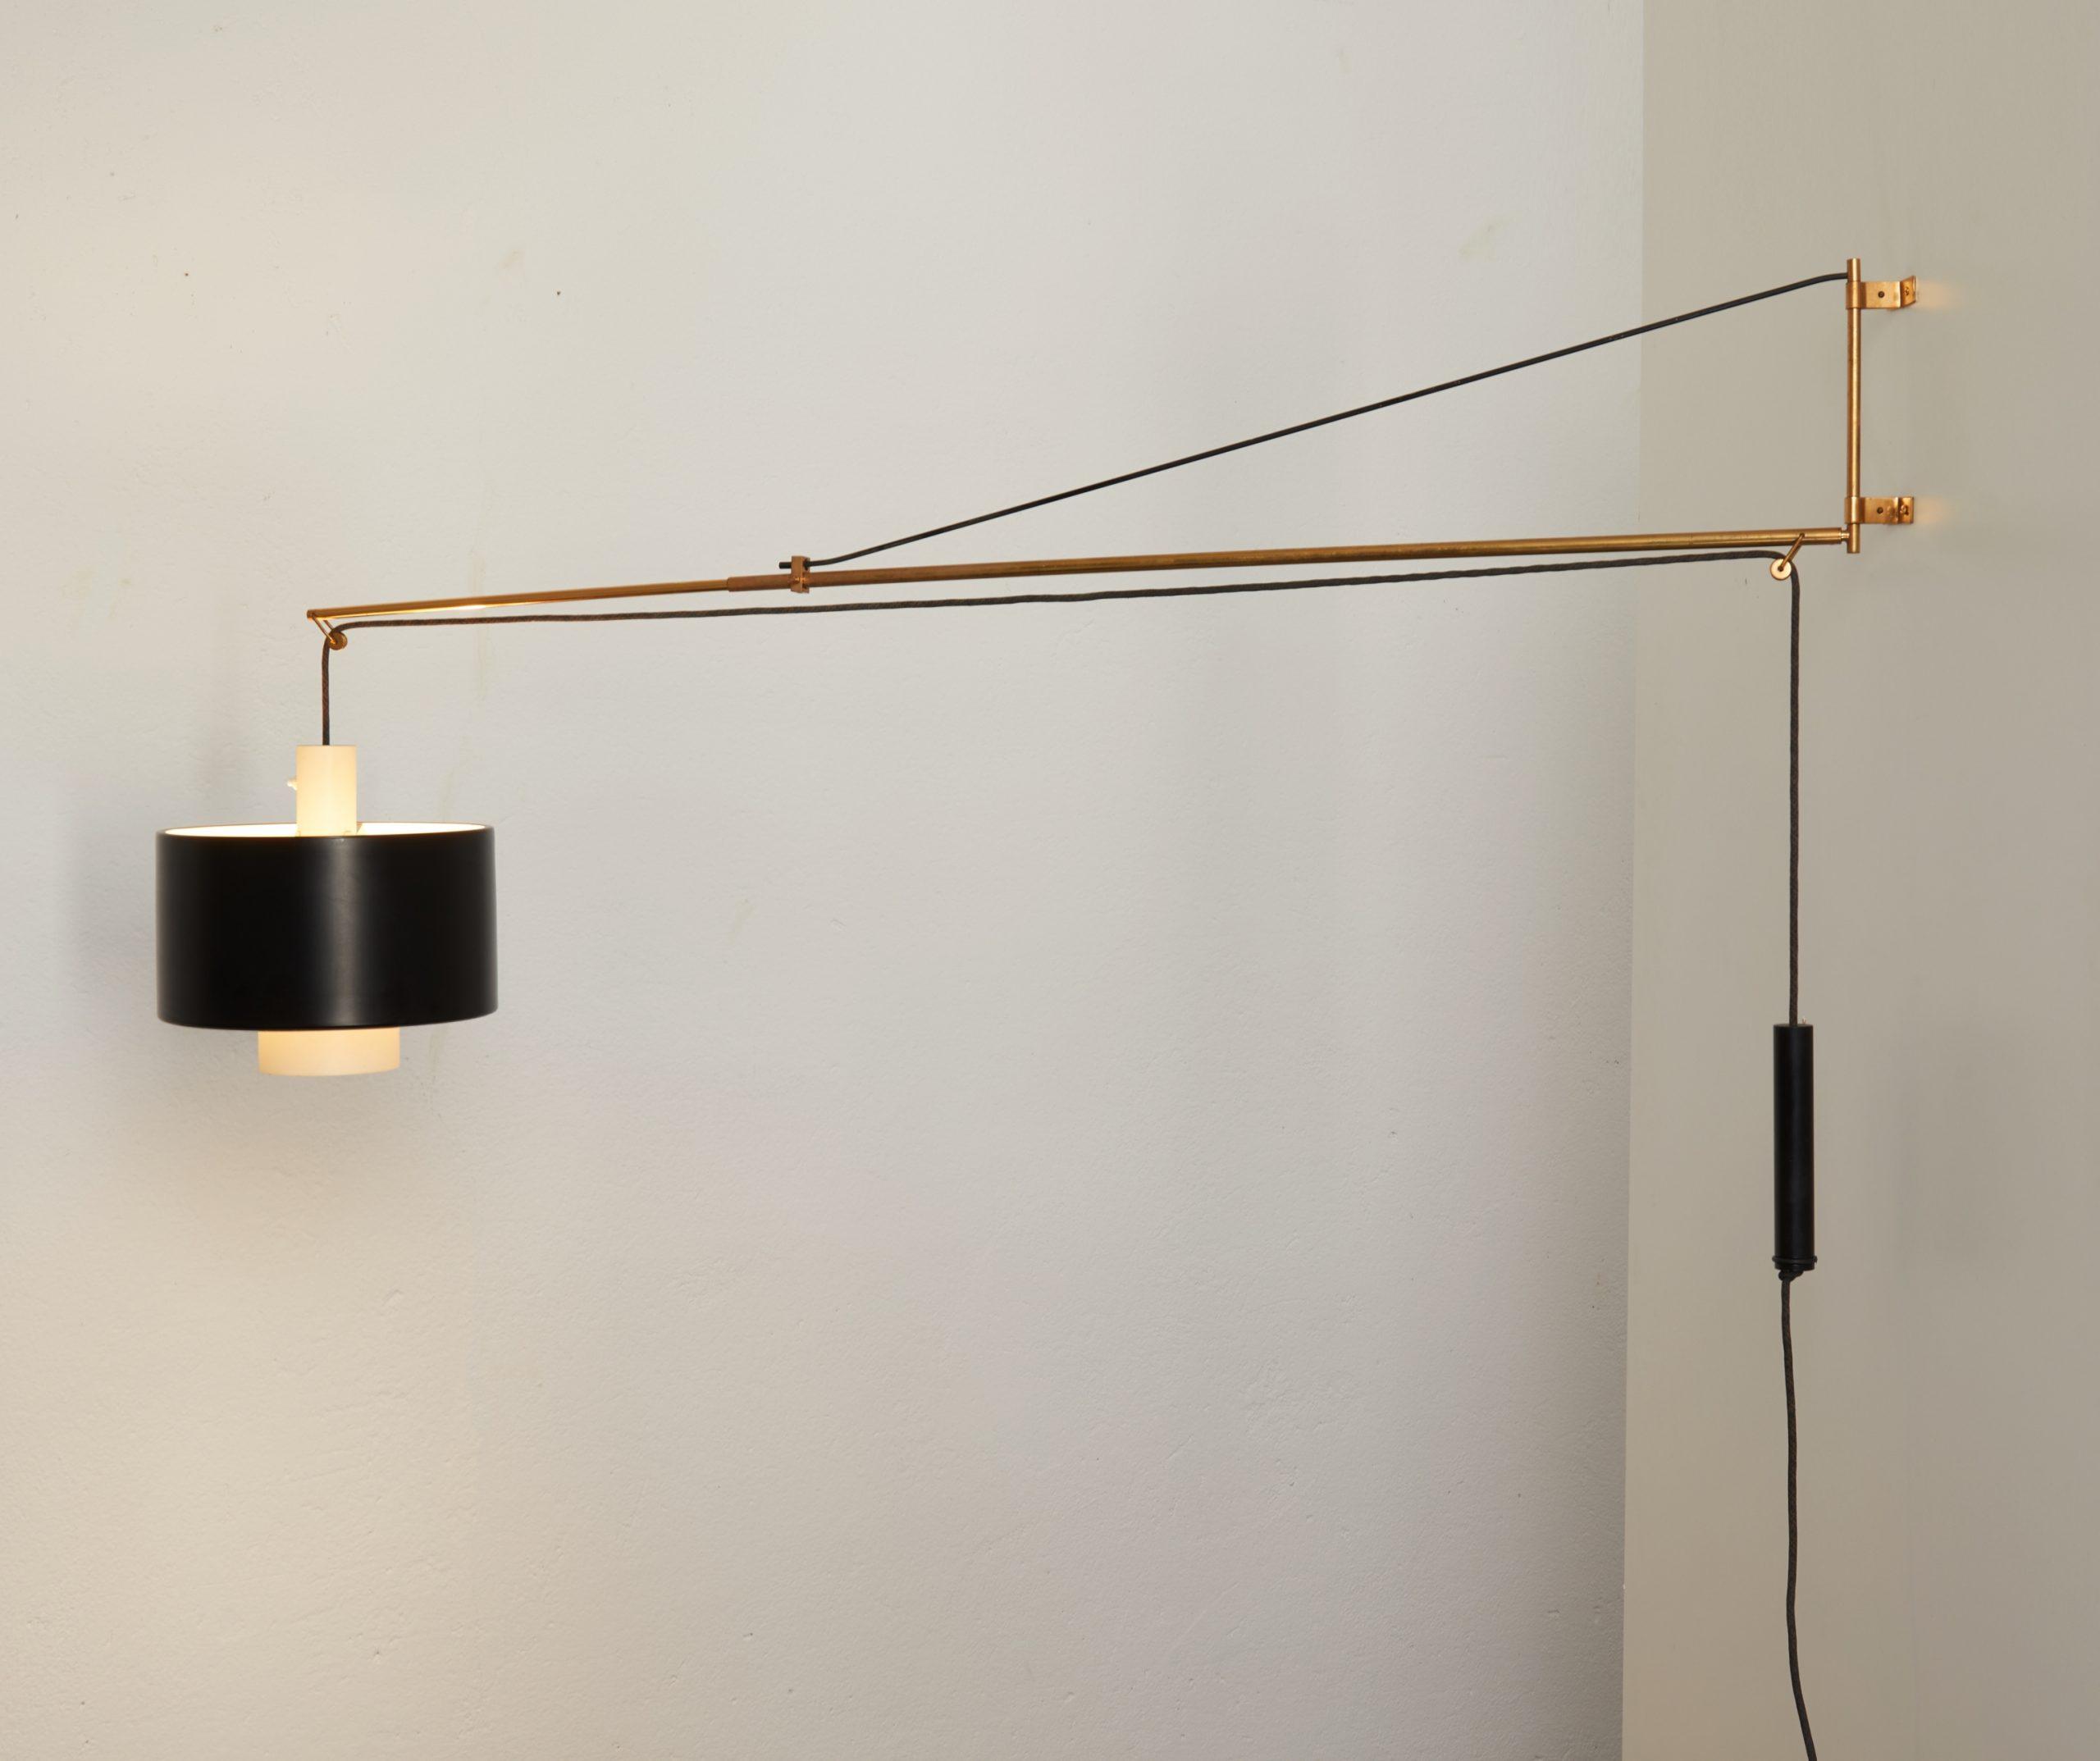 brass-wall-lamp-model-2061-by-gaetano-scolari-for-stilnovo-1954-image-07